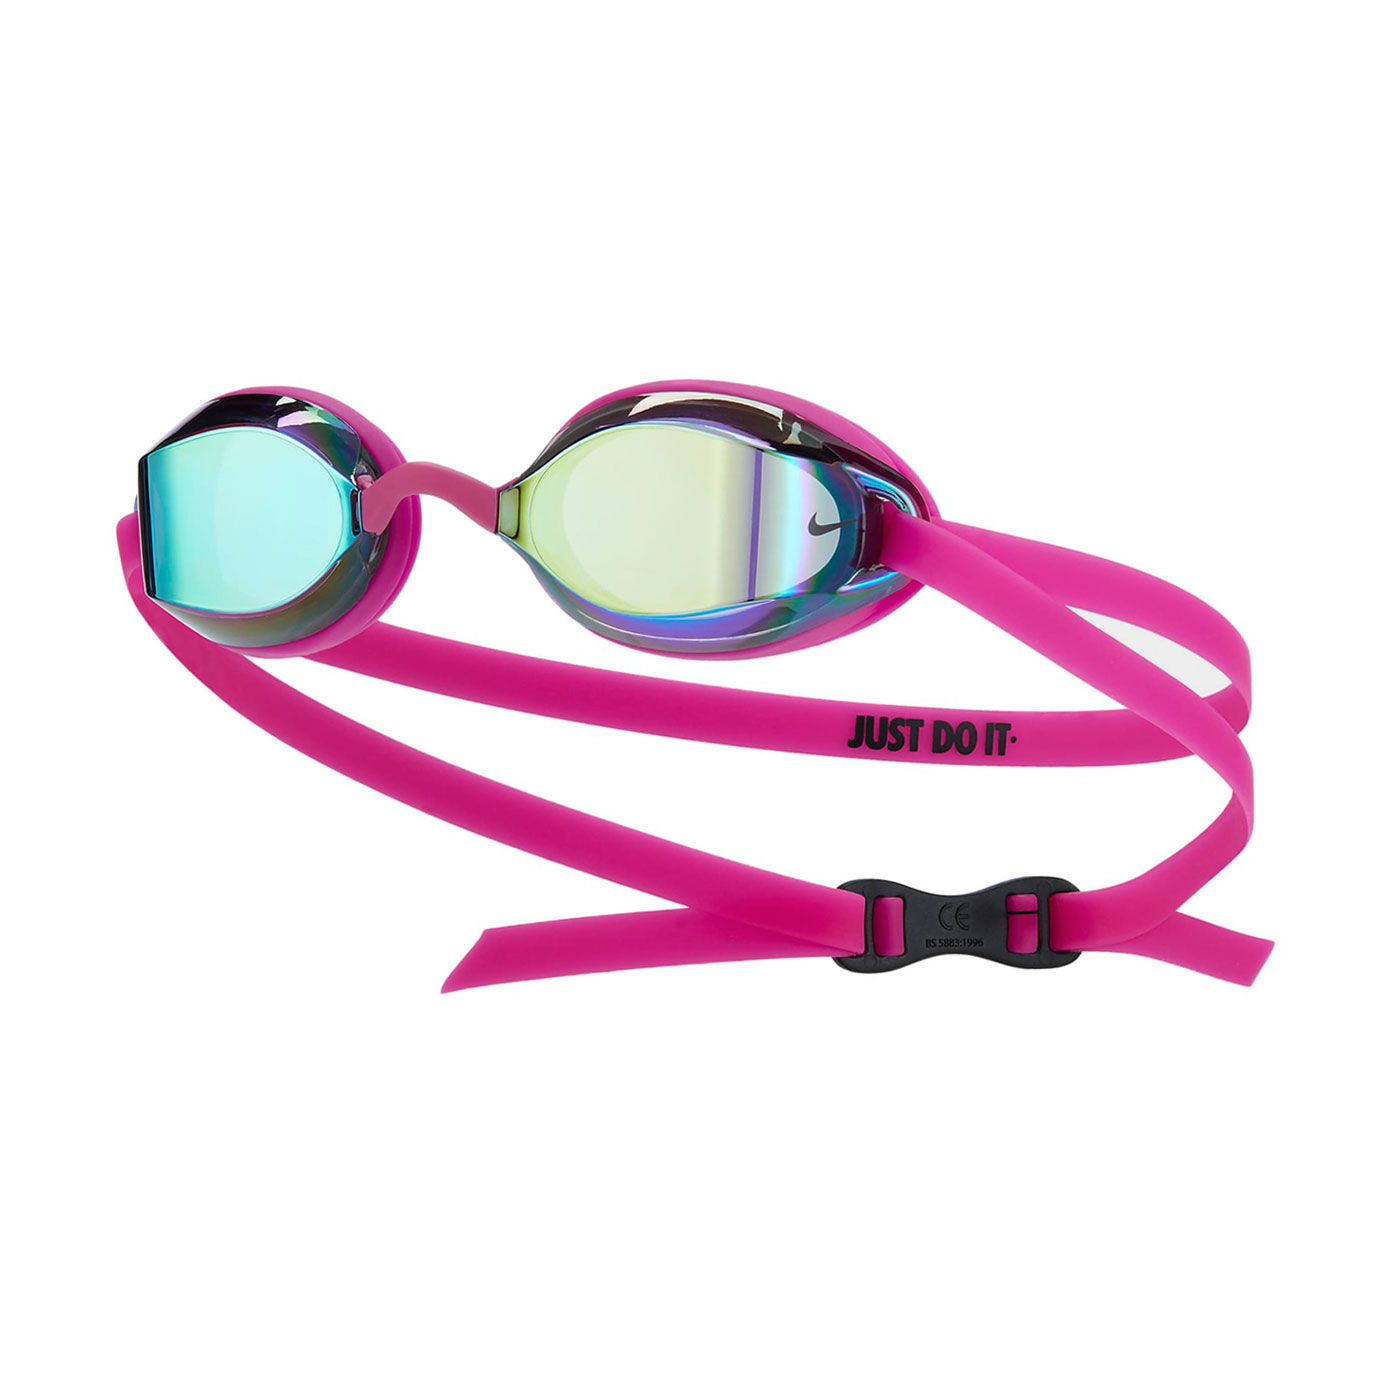 NIKE SWIM 成人專業型鏡面泳鏡 NESSA178-710